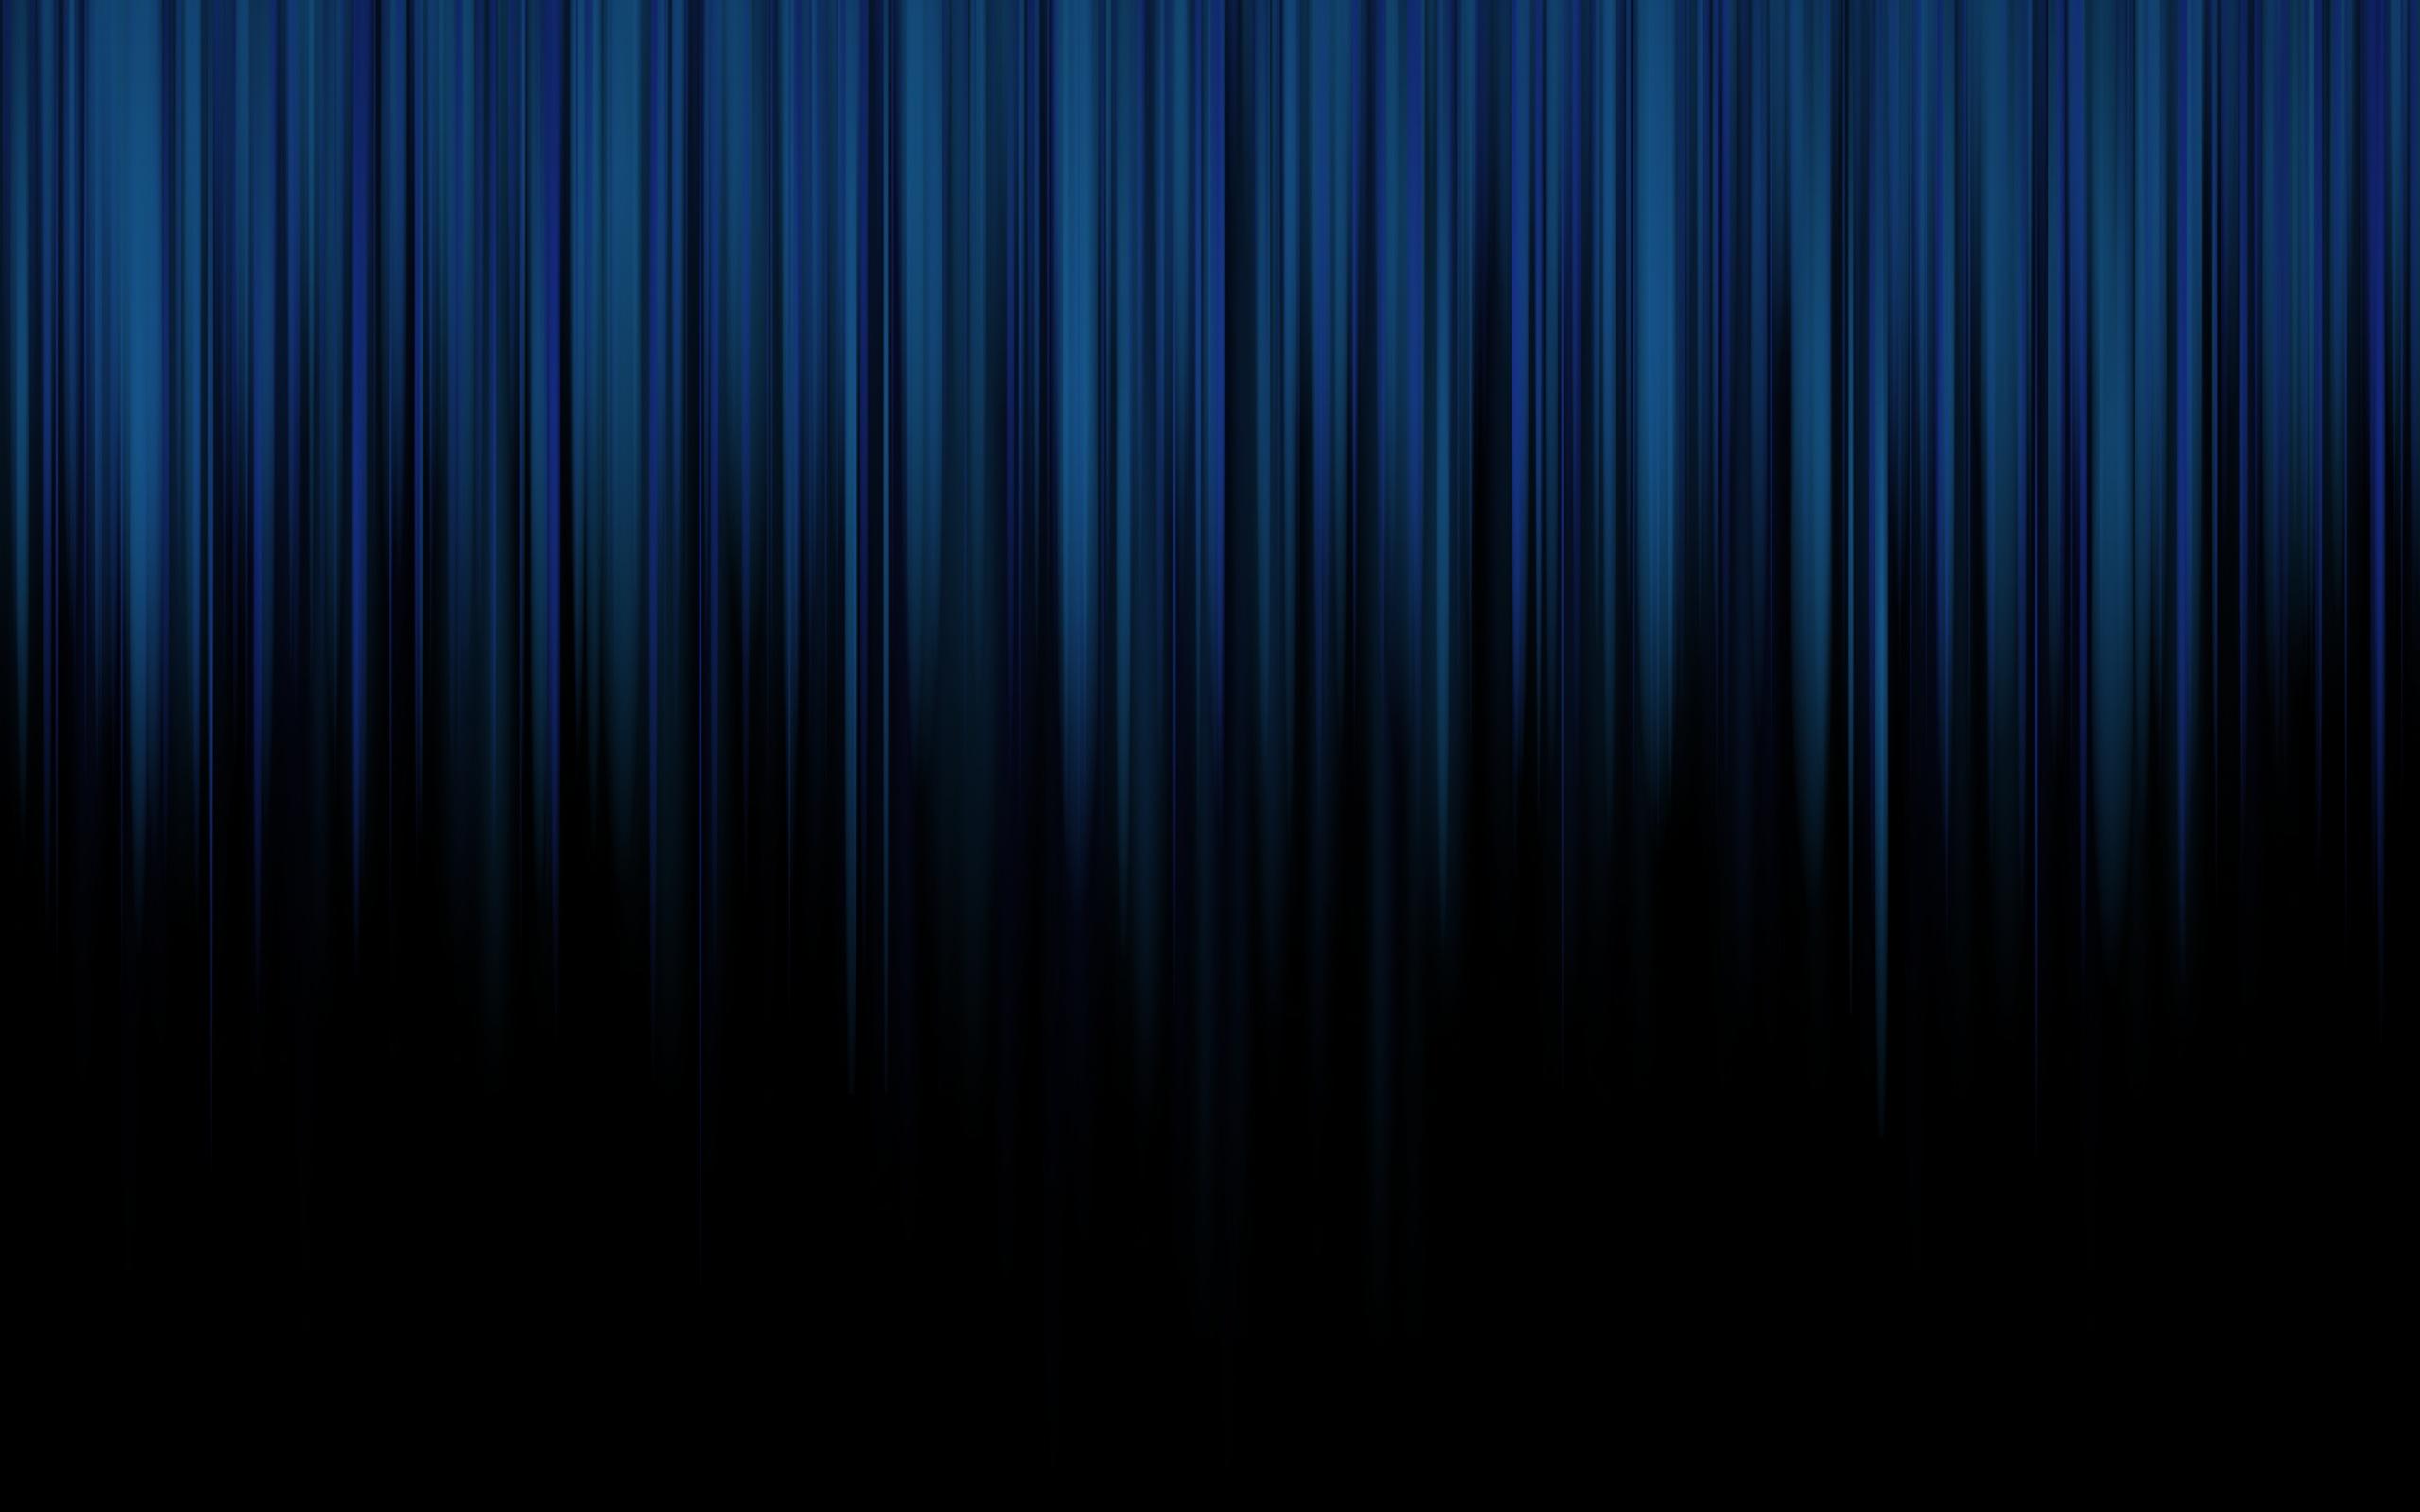 HD Black and Blue Backgrounds   PixelsTalk Net